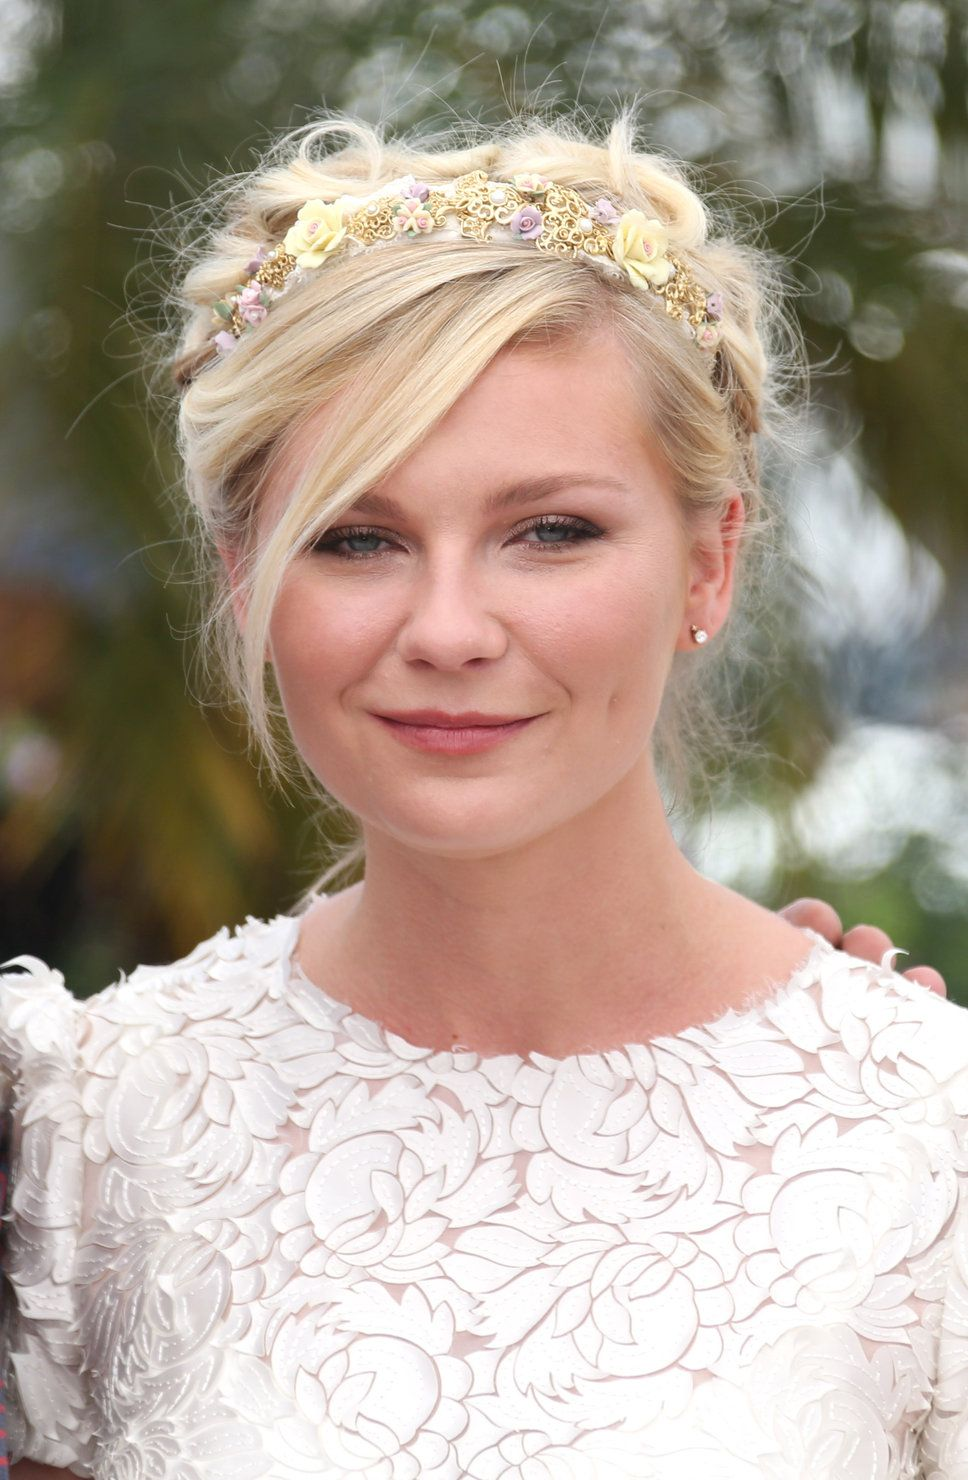 kirsten dunst sloppy side-parted blonde floral headband coiffure